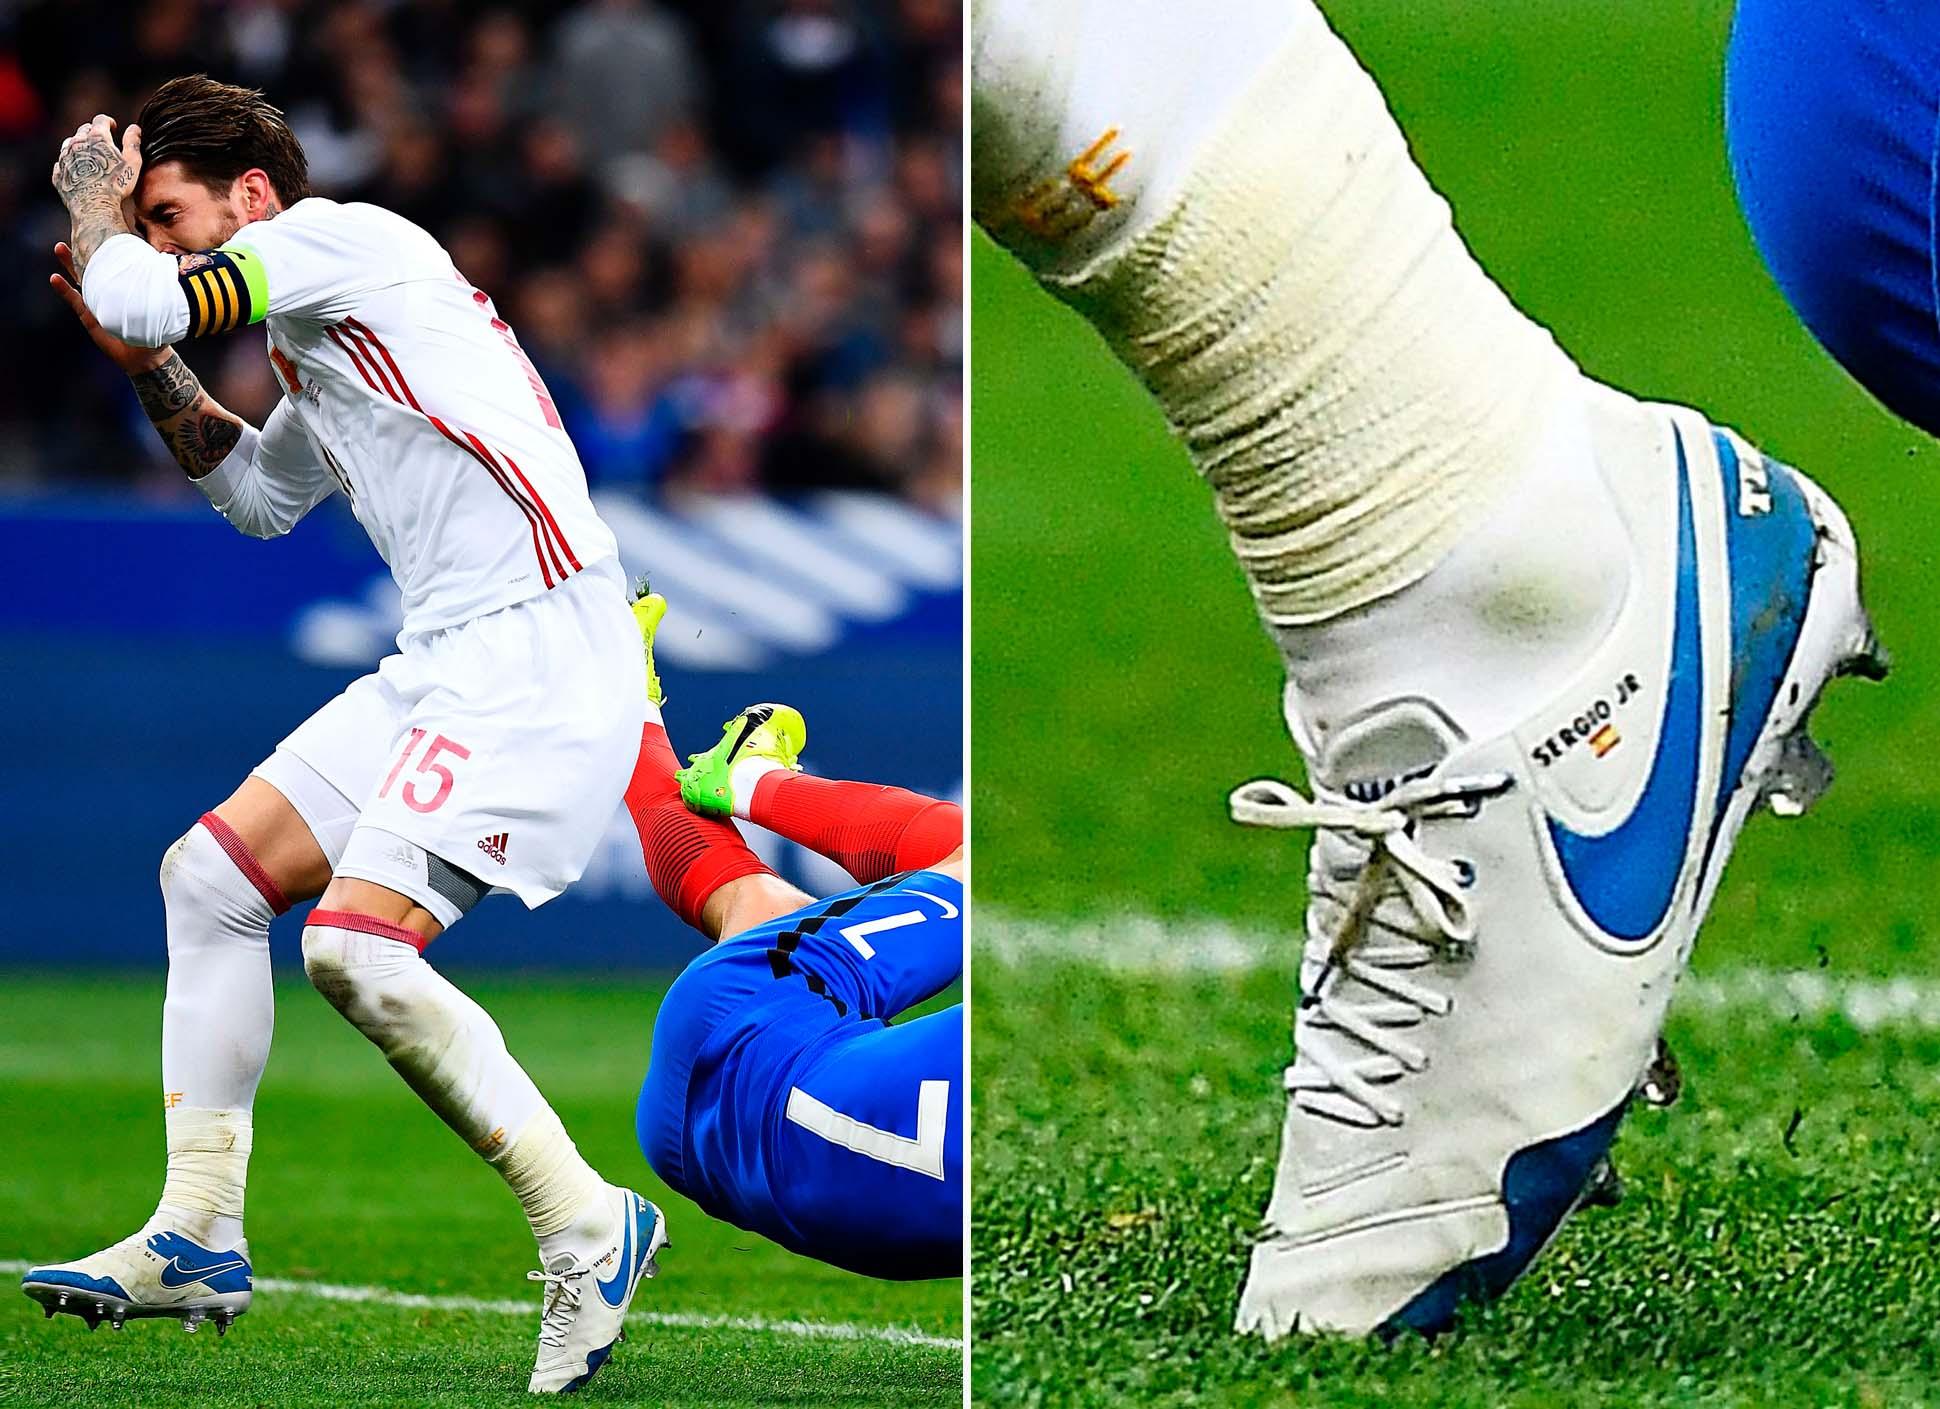 Bonucci & Strootman Wear Nike Air Max Magista Football Boots